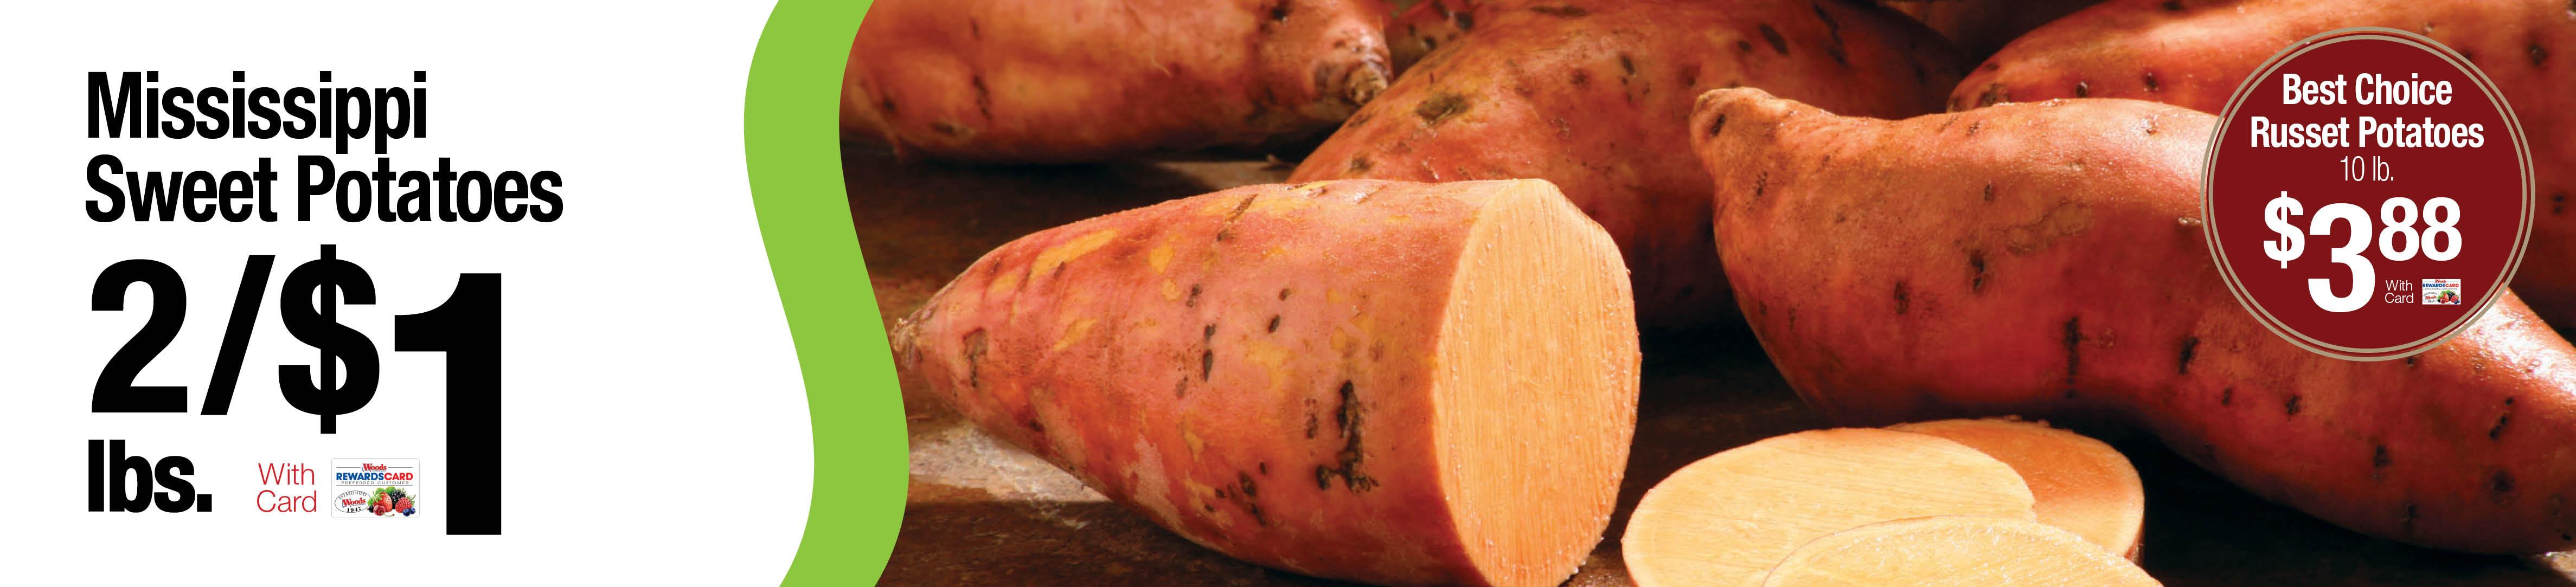 Sweet Potatoes 2 lbs/$1